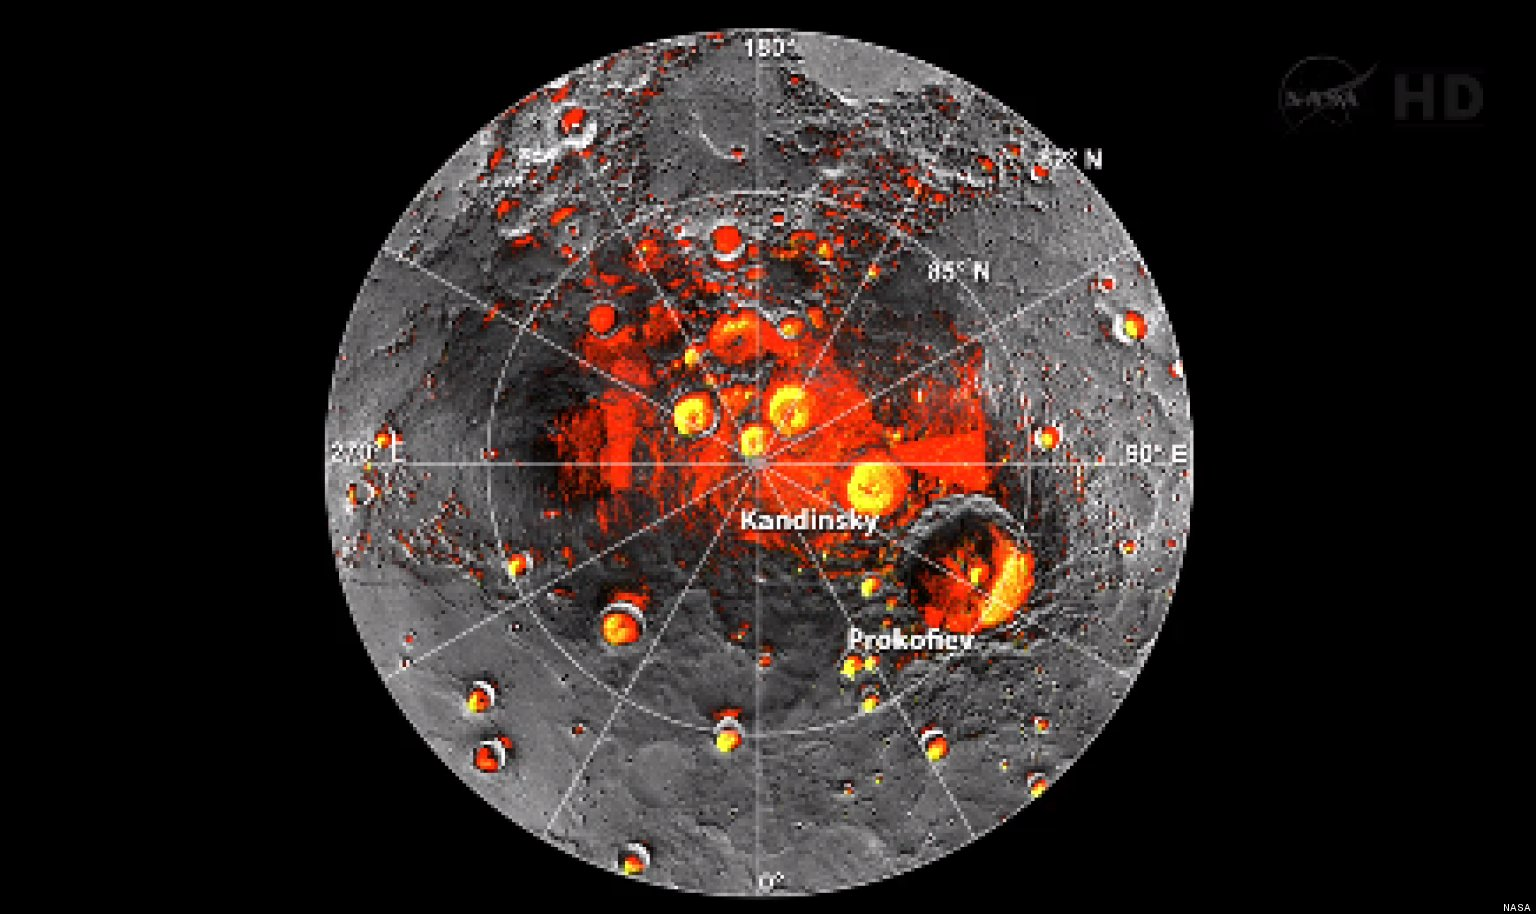 $100 billion planets - photo #10